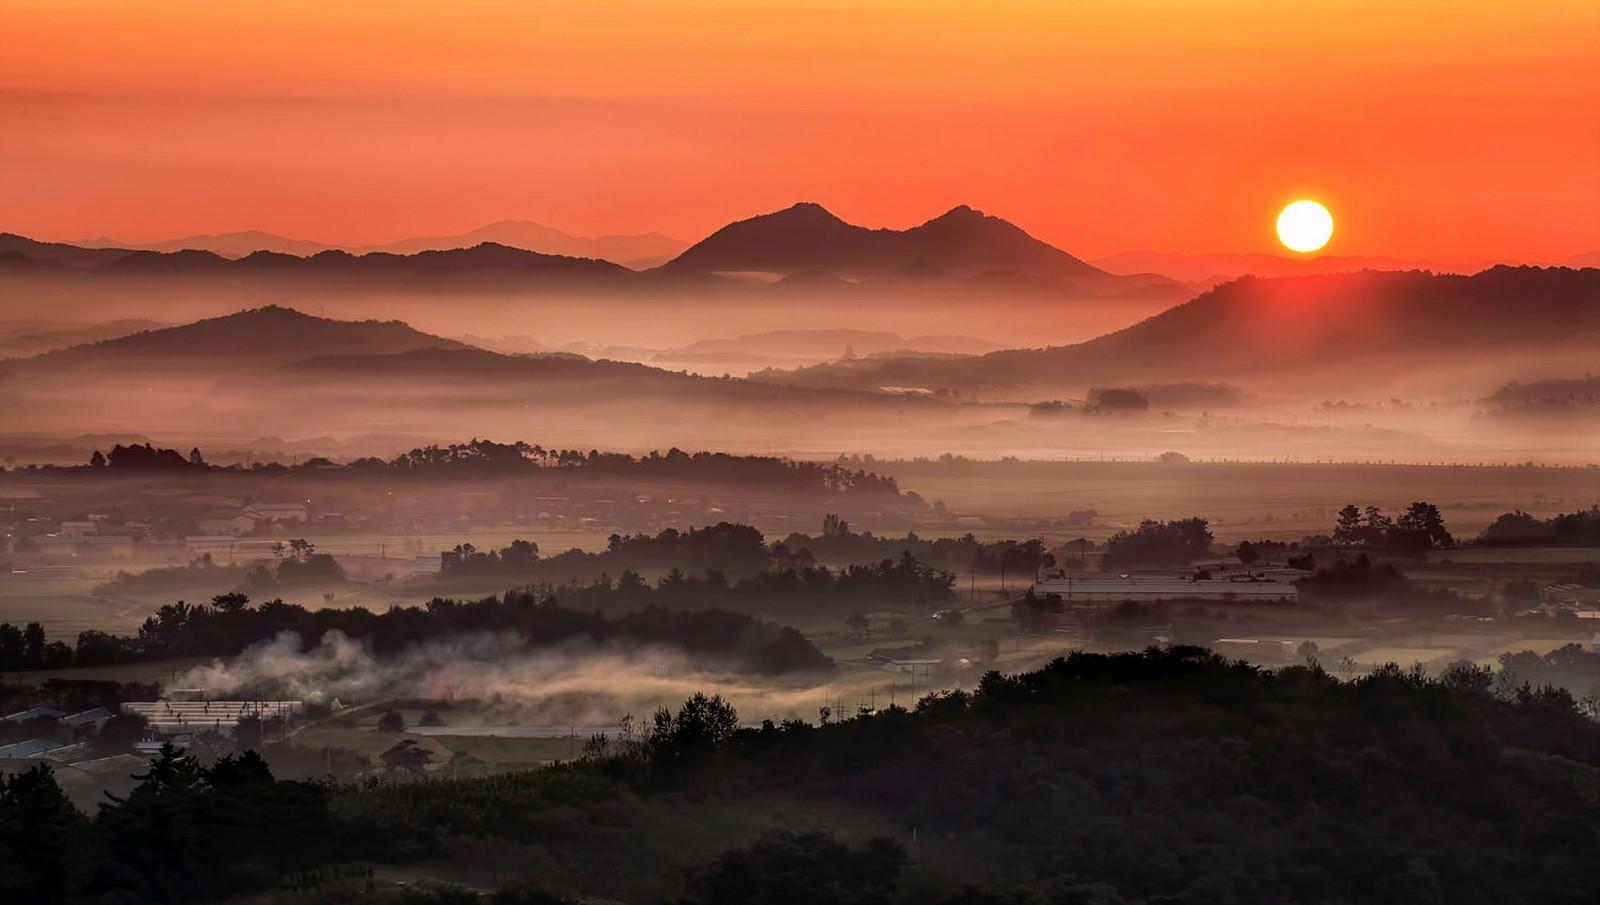 landscape Photography Nature Morning Mist Mountains